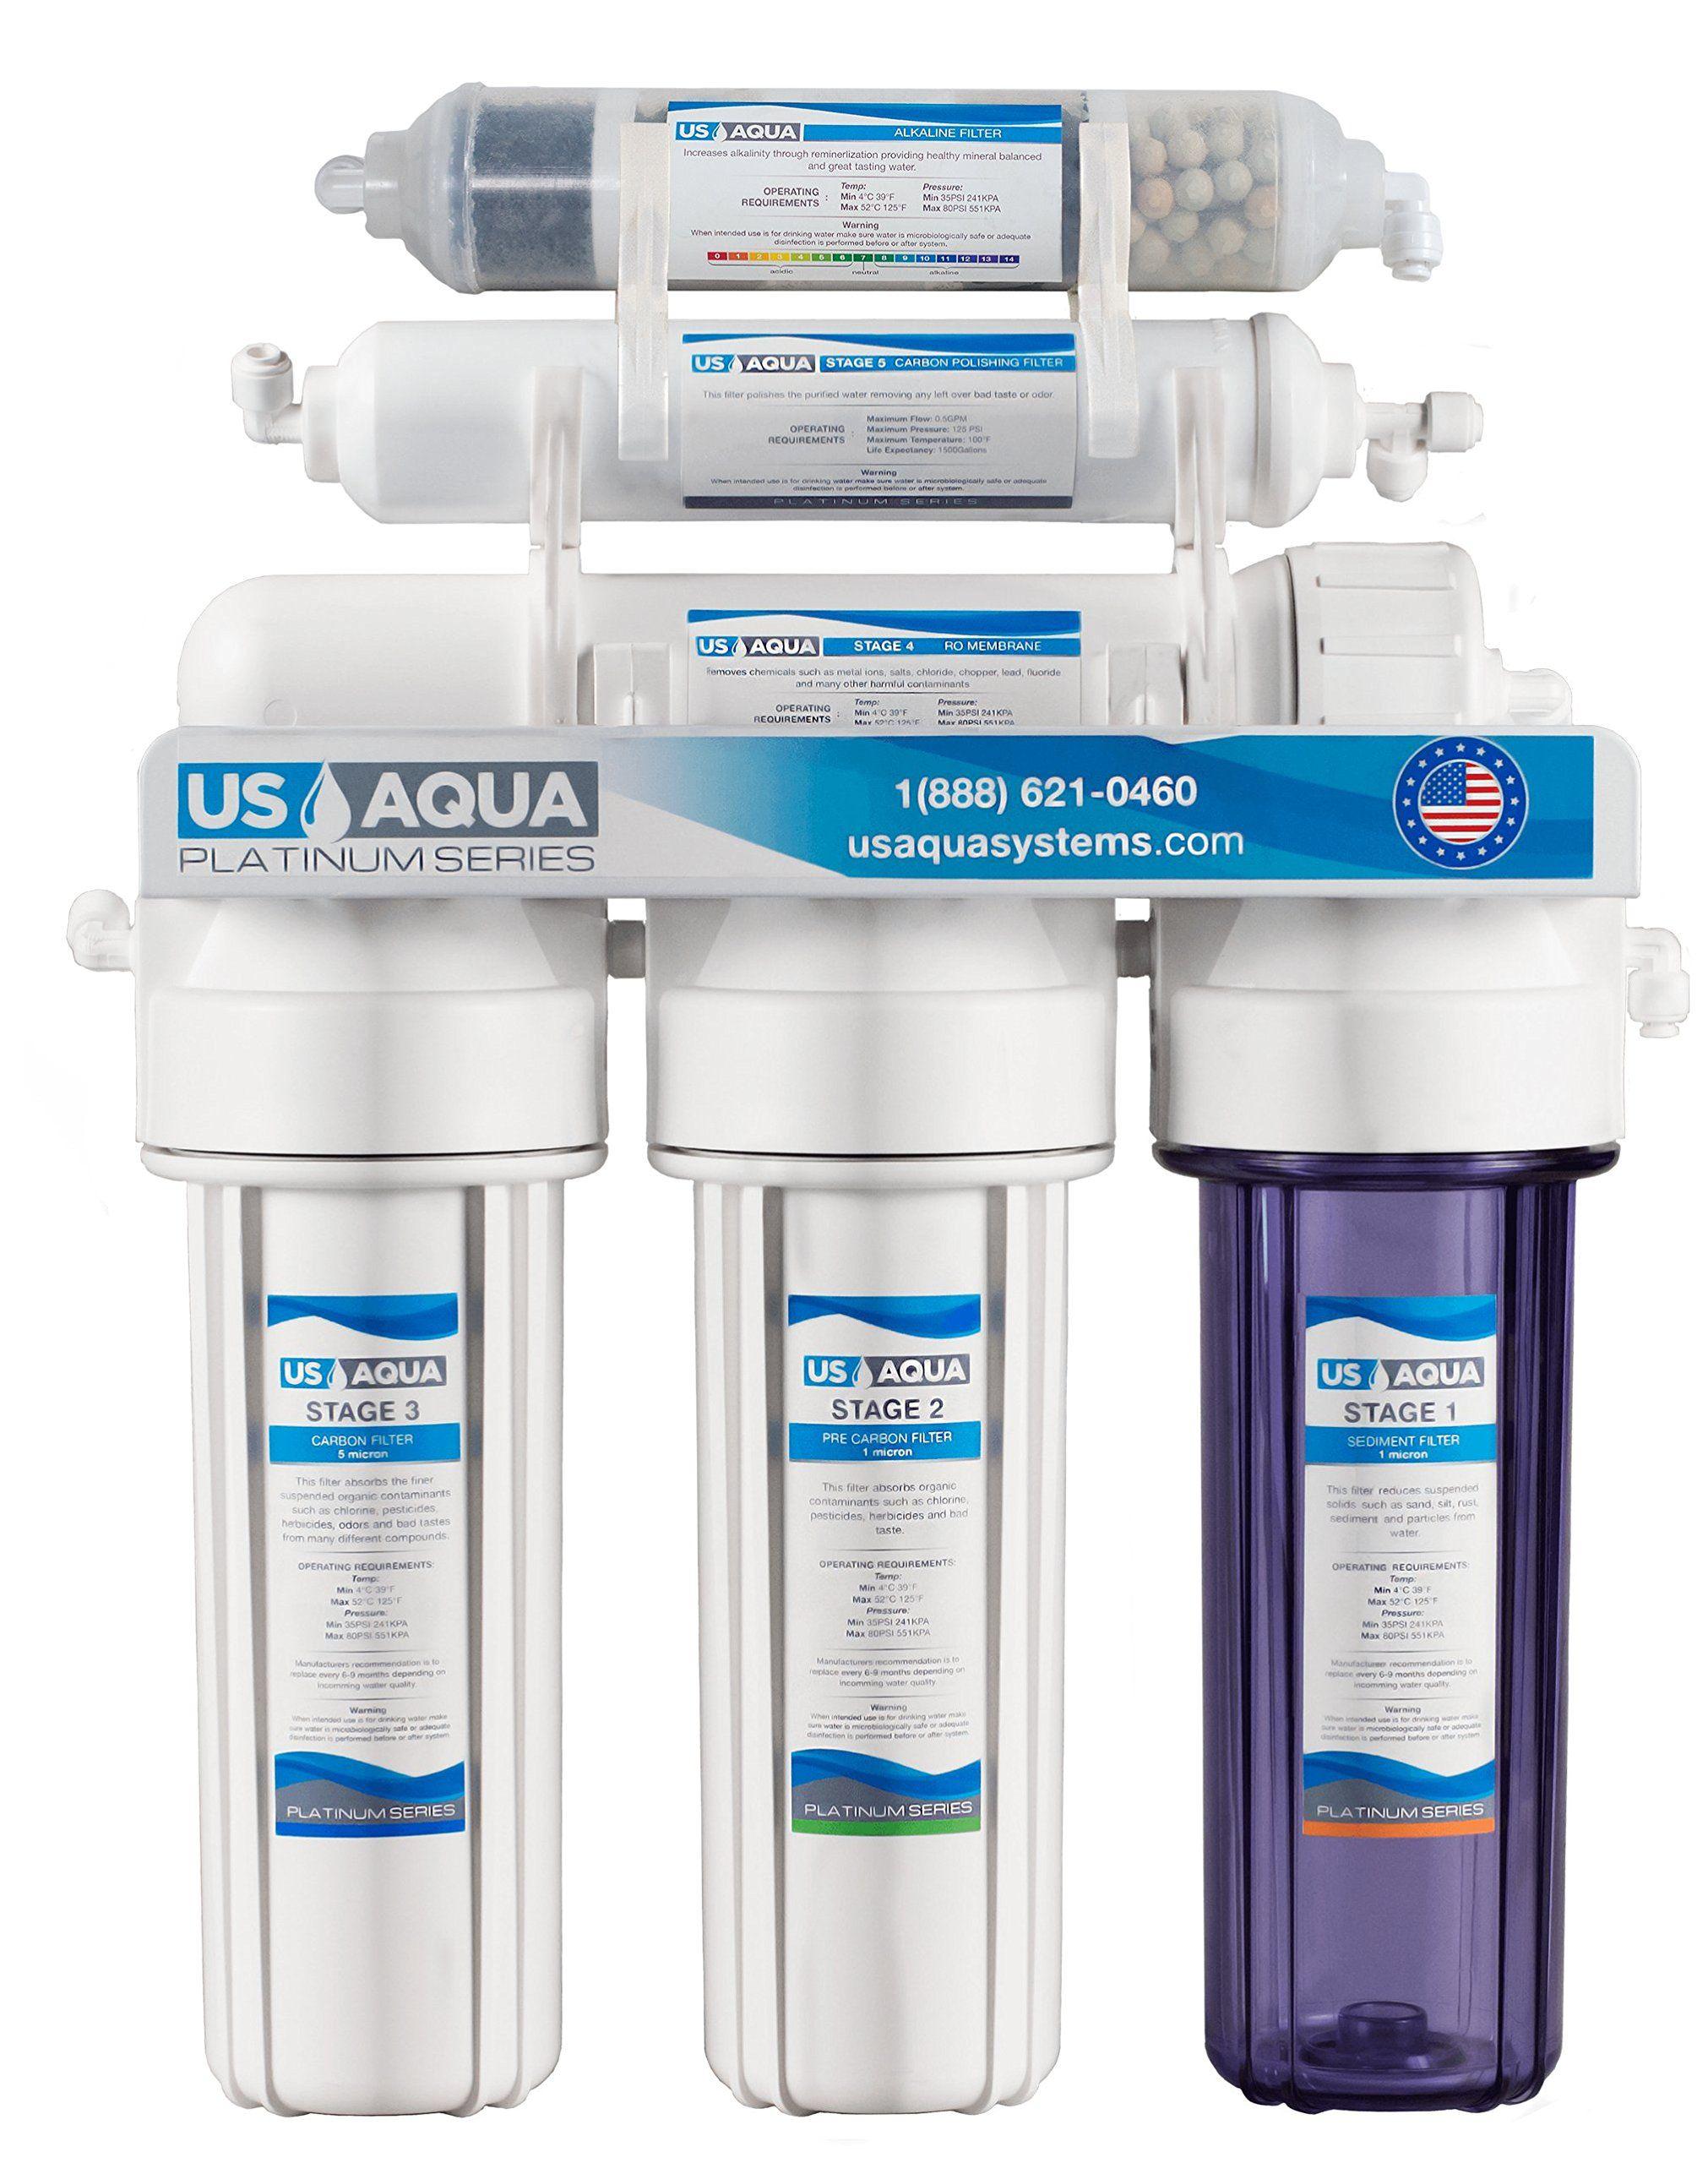 Us Aqua Platinum Series Deluxe High Capacity 100gpd Under Sink Reverse Osmosis Purifier Drinking Wat Water Filter Refrigerator Water Filter Monogram Appliances